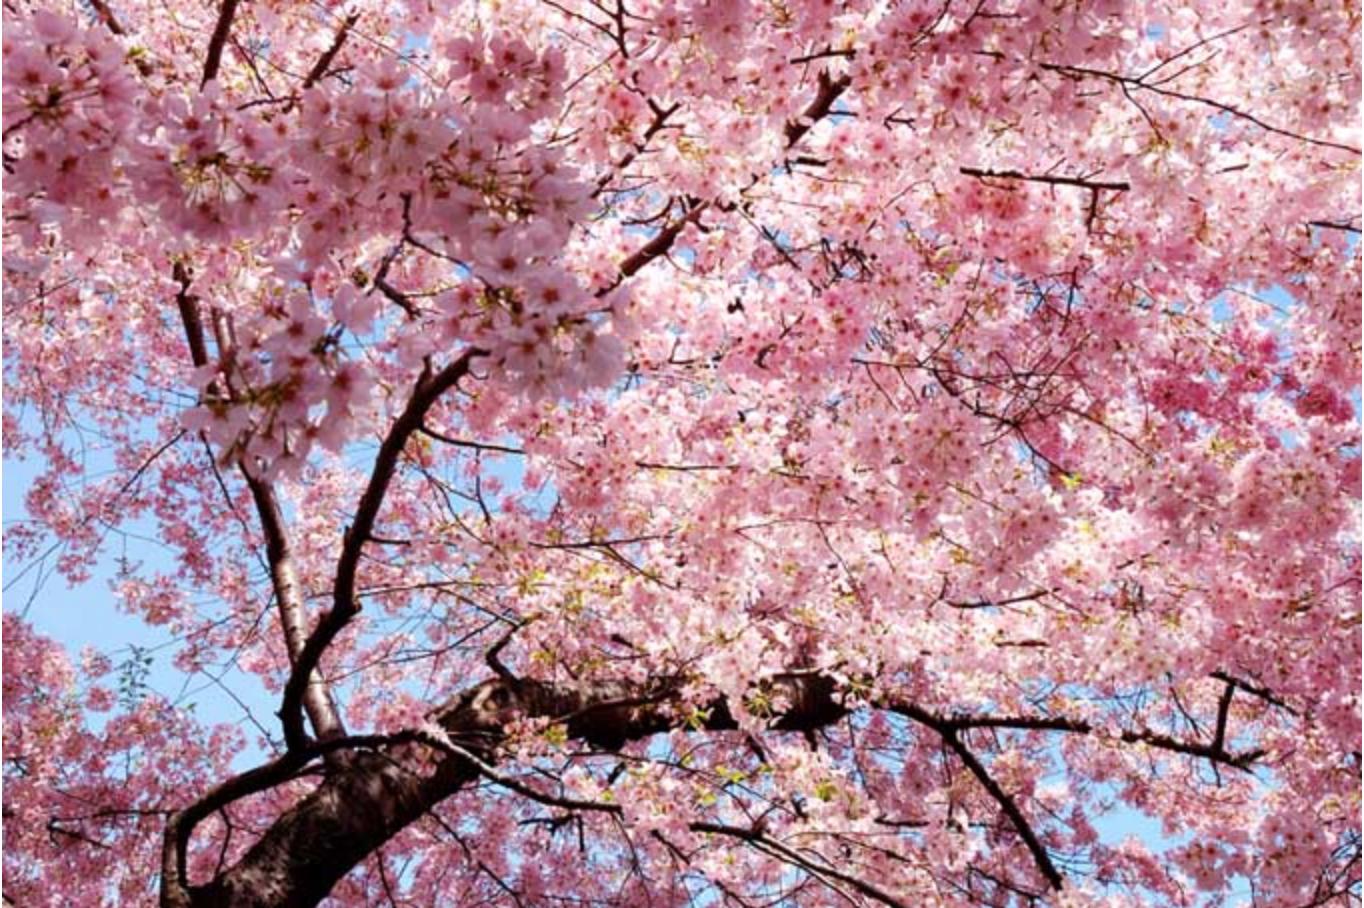 Pin By Heather Lenkin On Sarosi Cherry Blossom Background Cherry Blossom Tree Landscape Trees